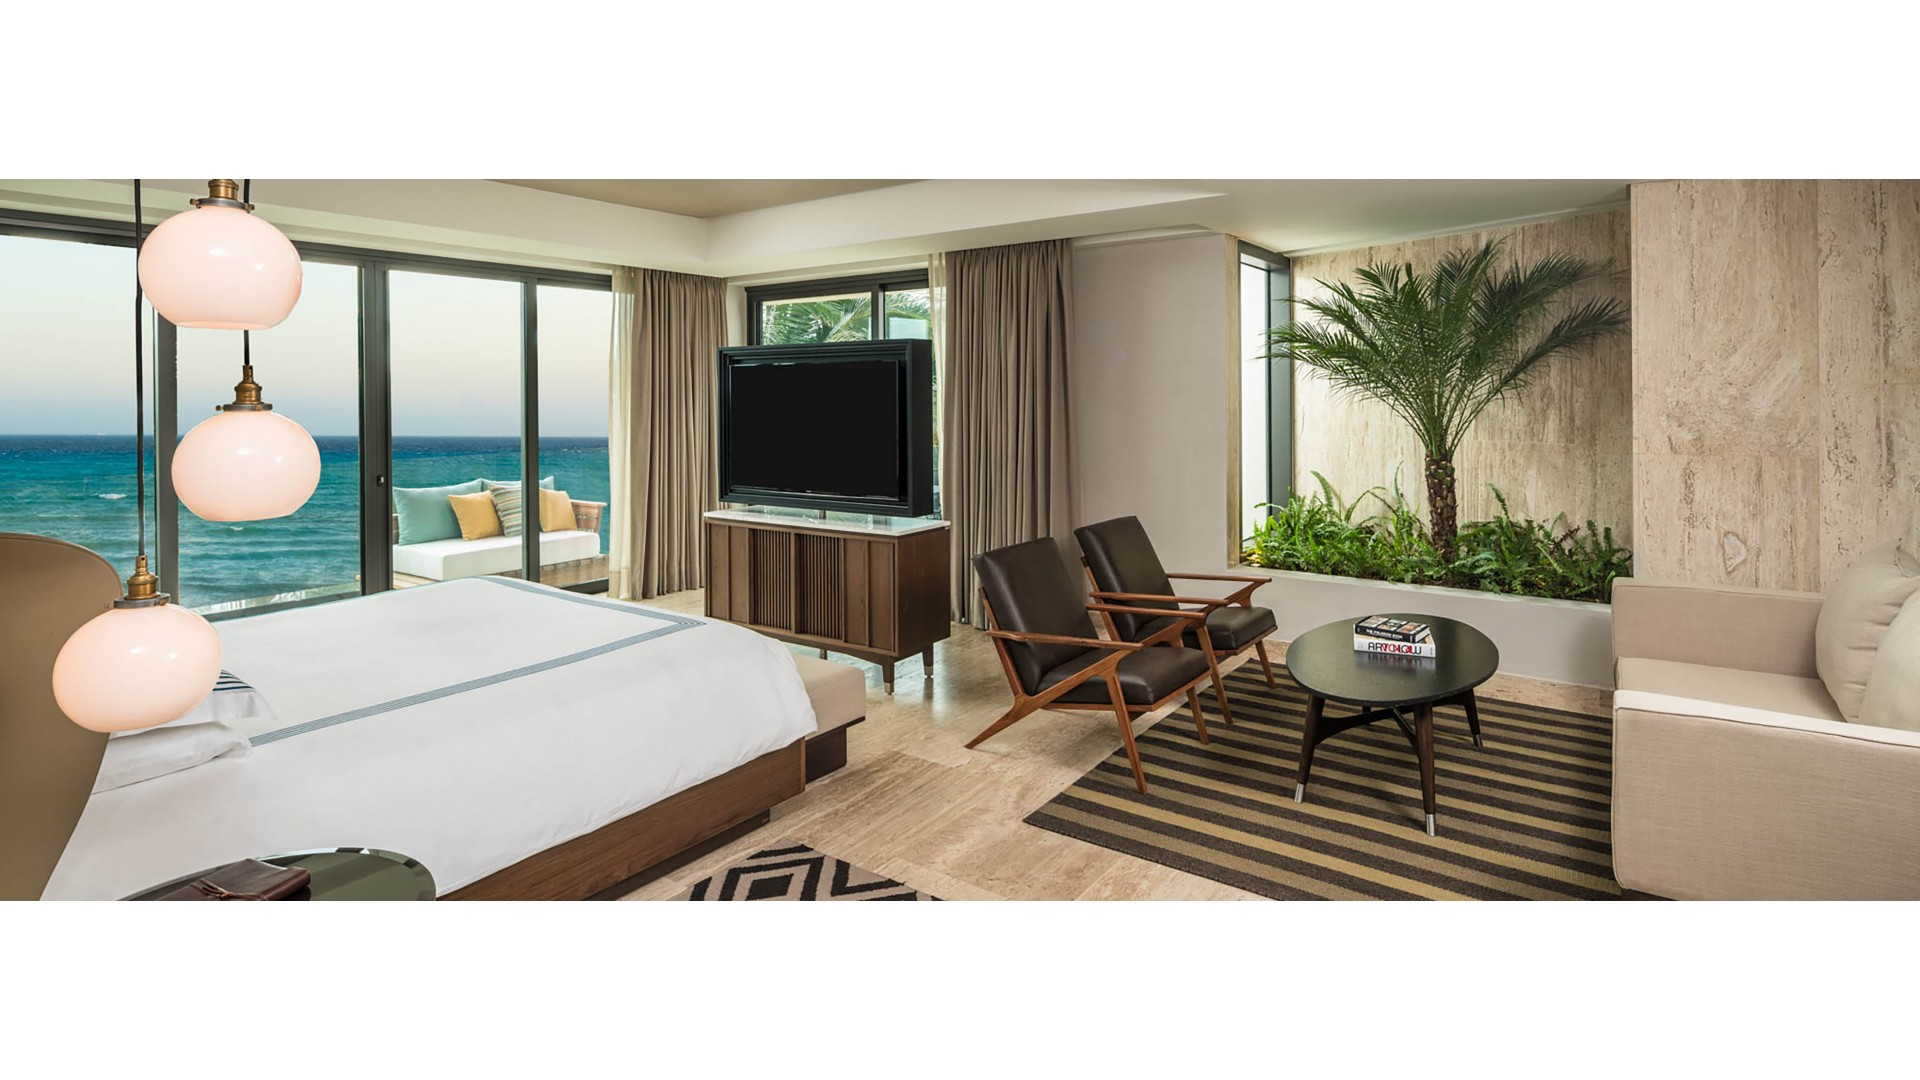 Thompson Playa del Carmen hotel - Playa Del Carmen, Playa del Carmen ...